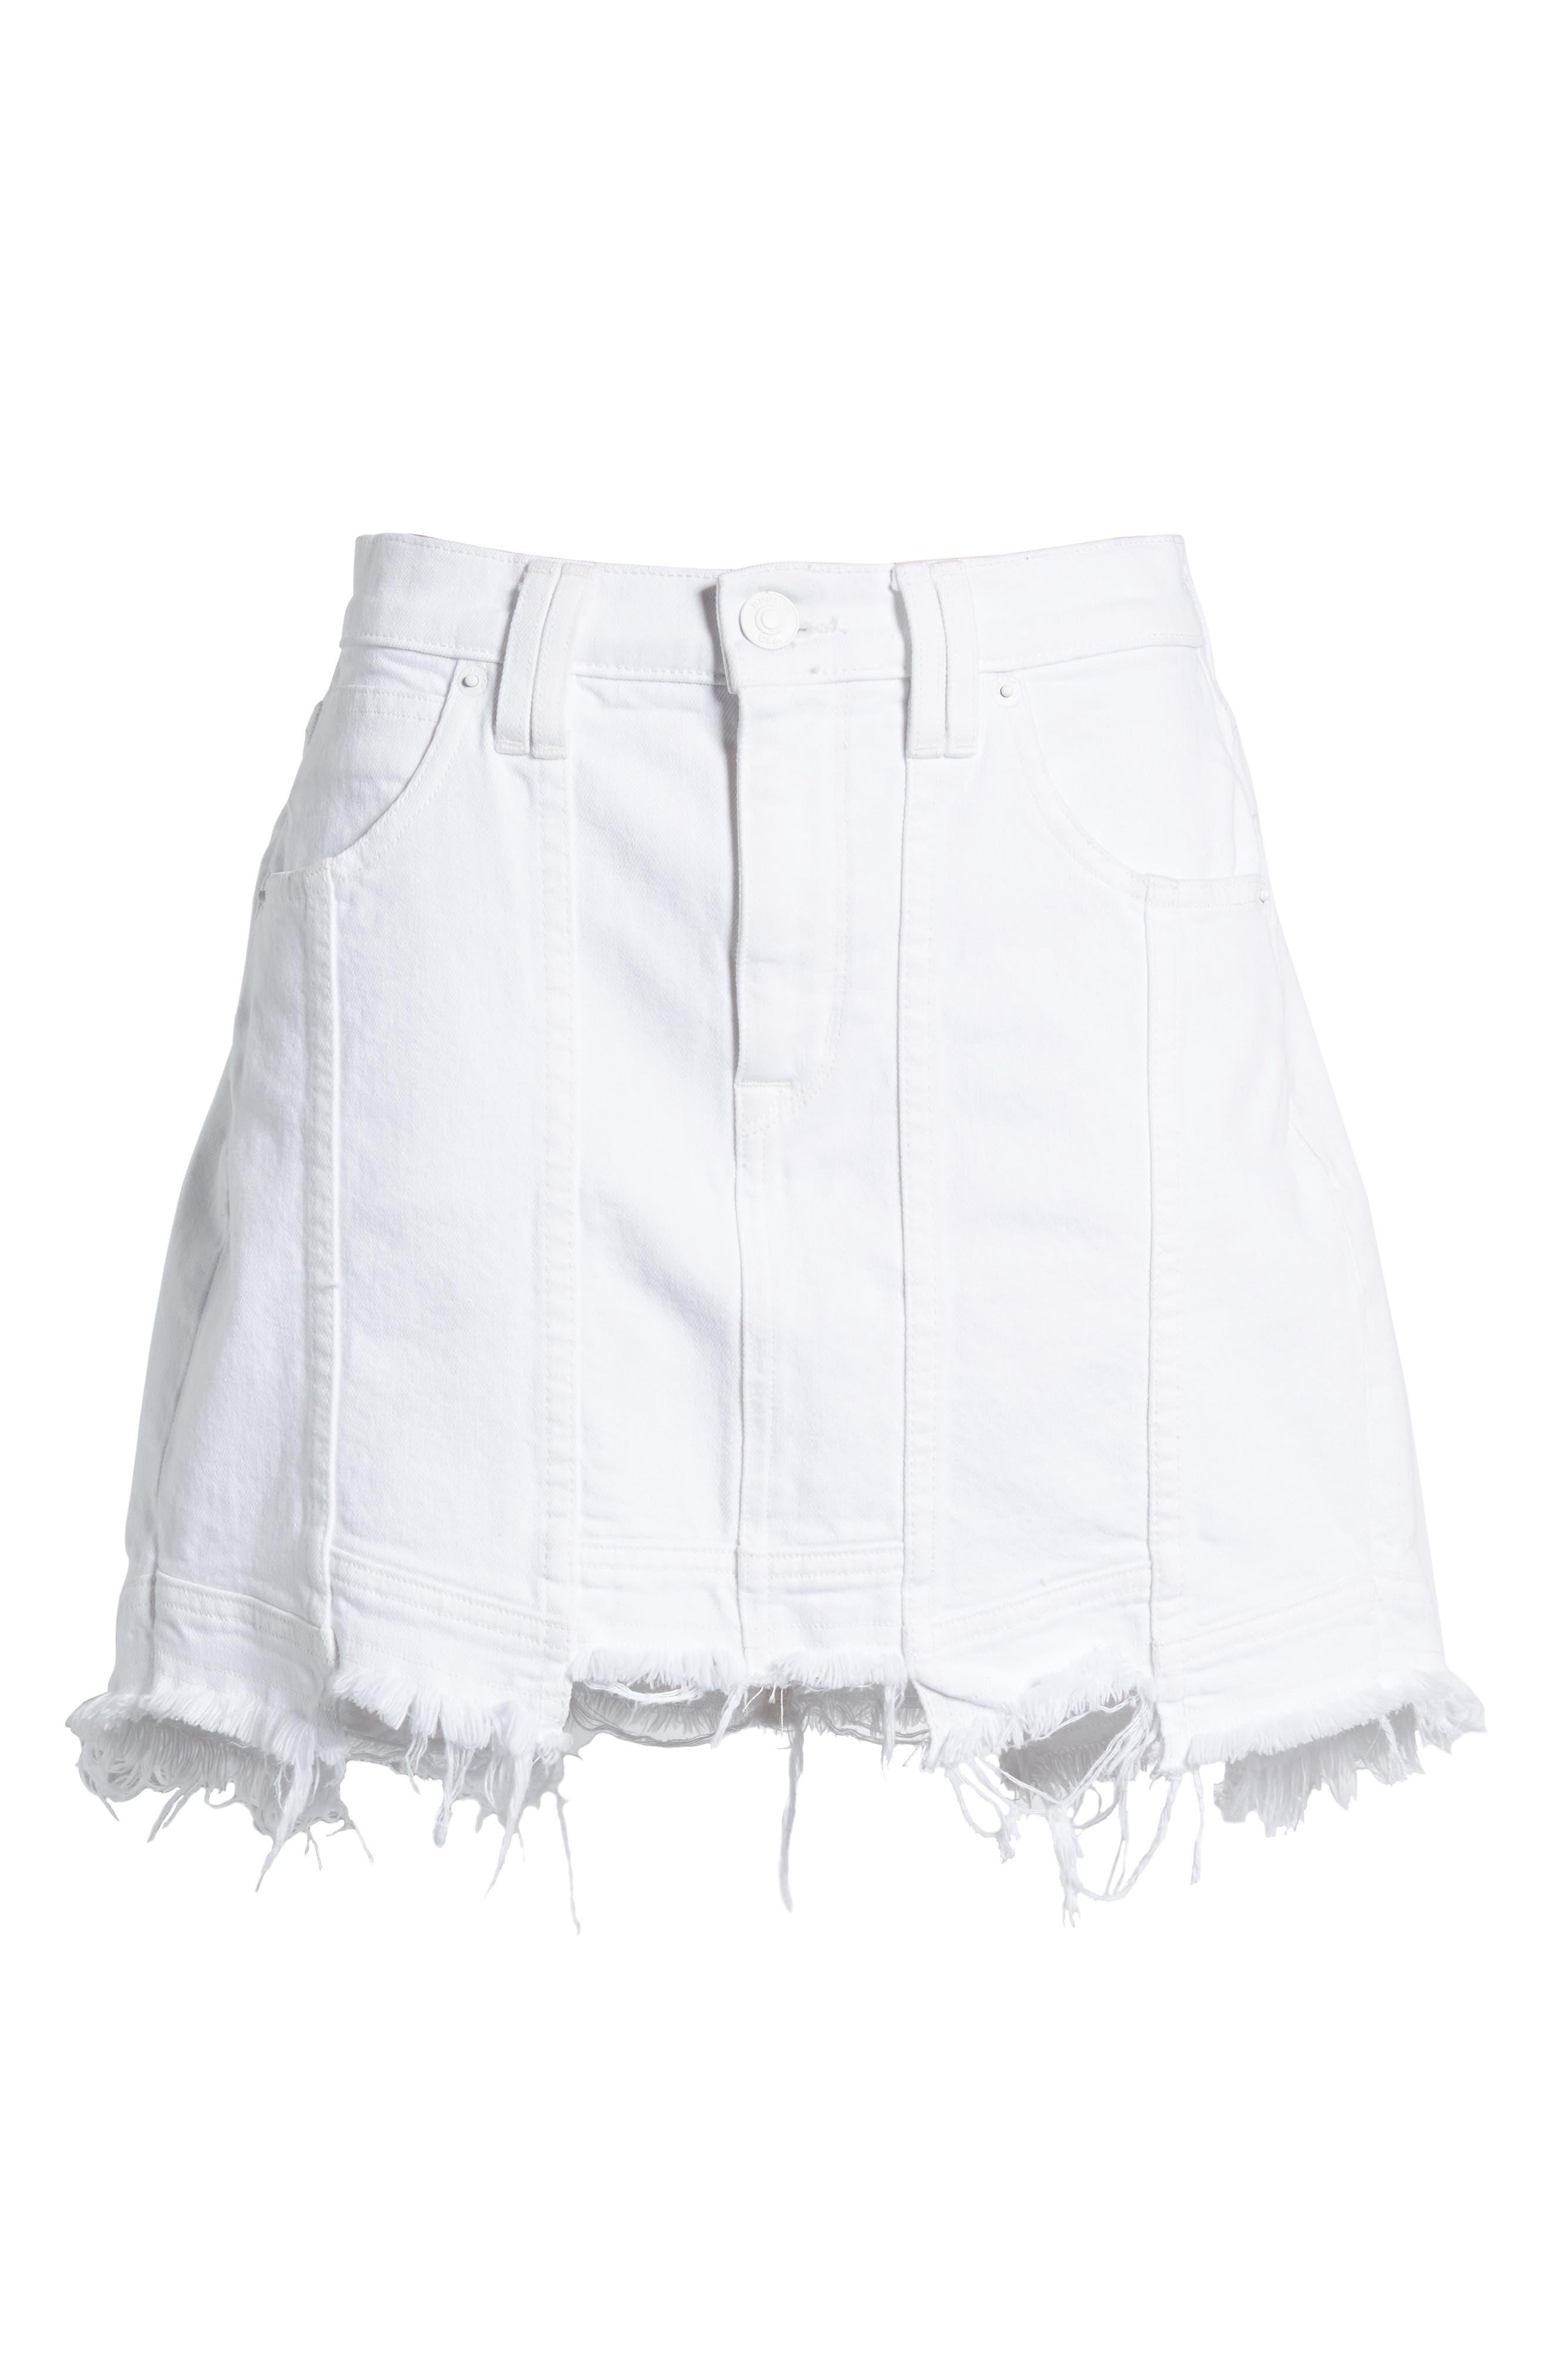 Raw Step Hem Denim Skirt,                             Alternate thumbnail 6, color,                             120